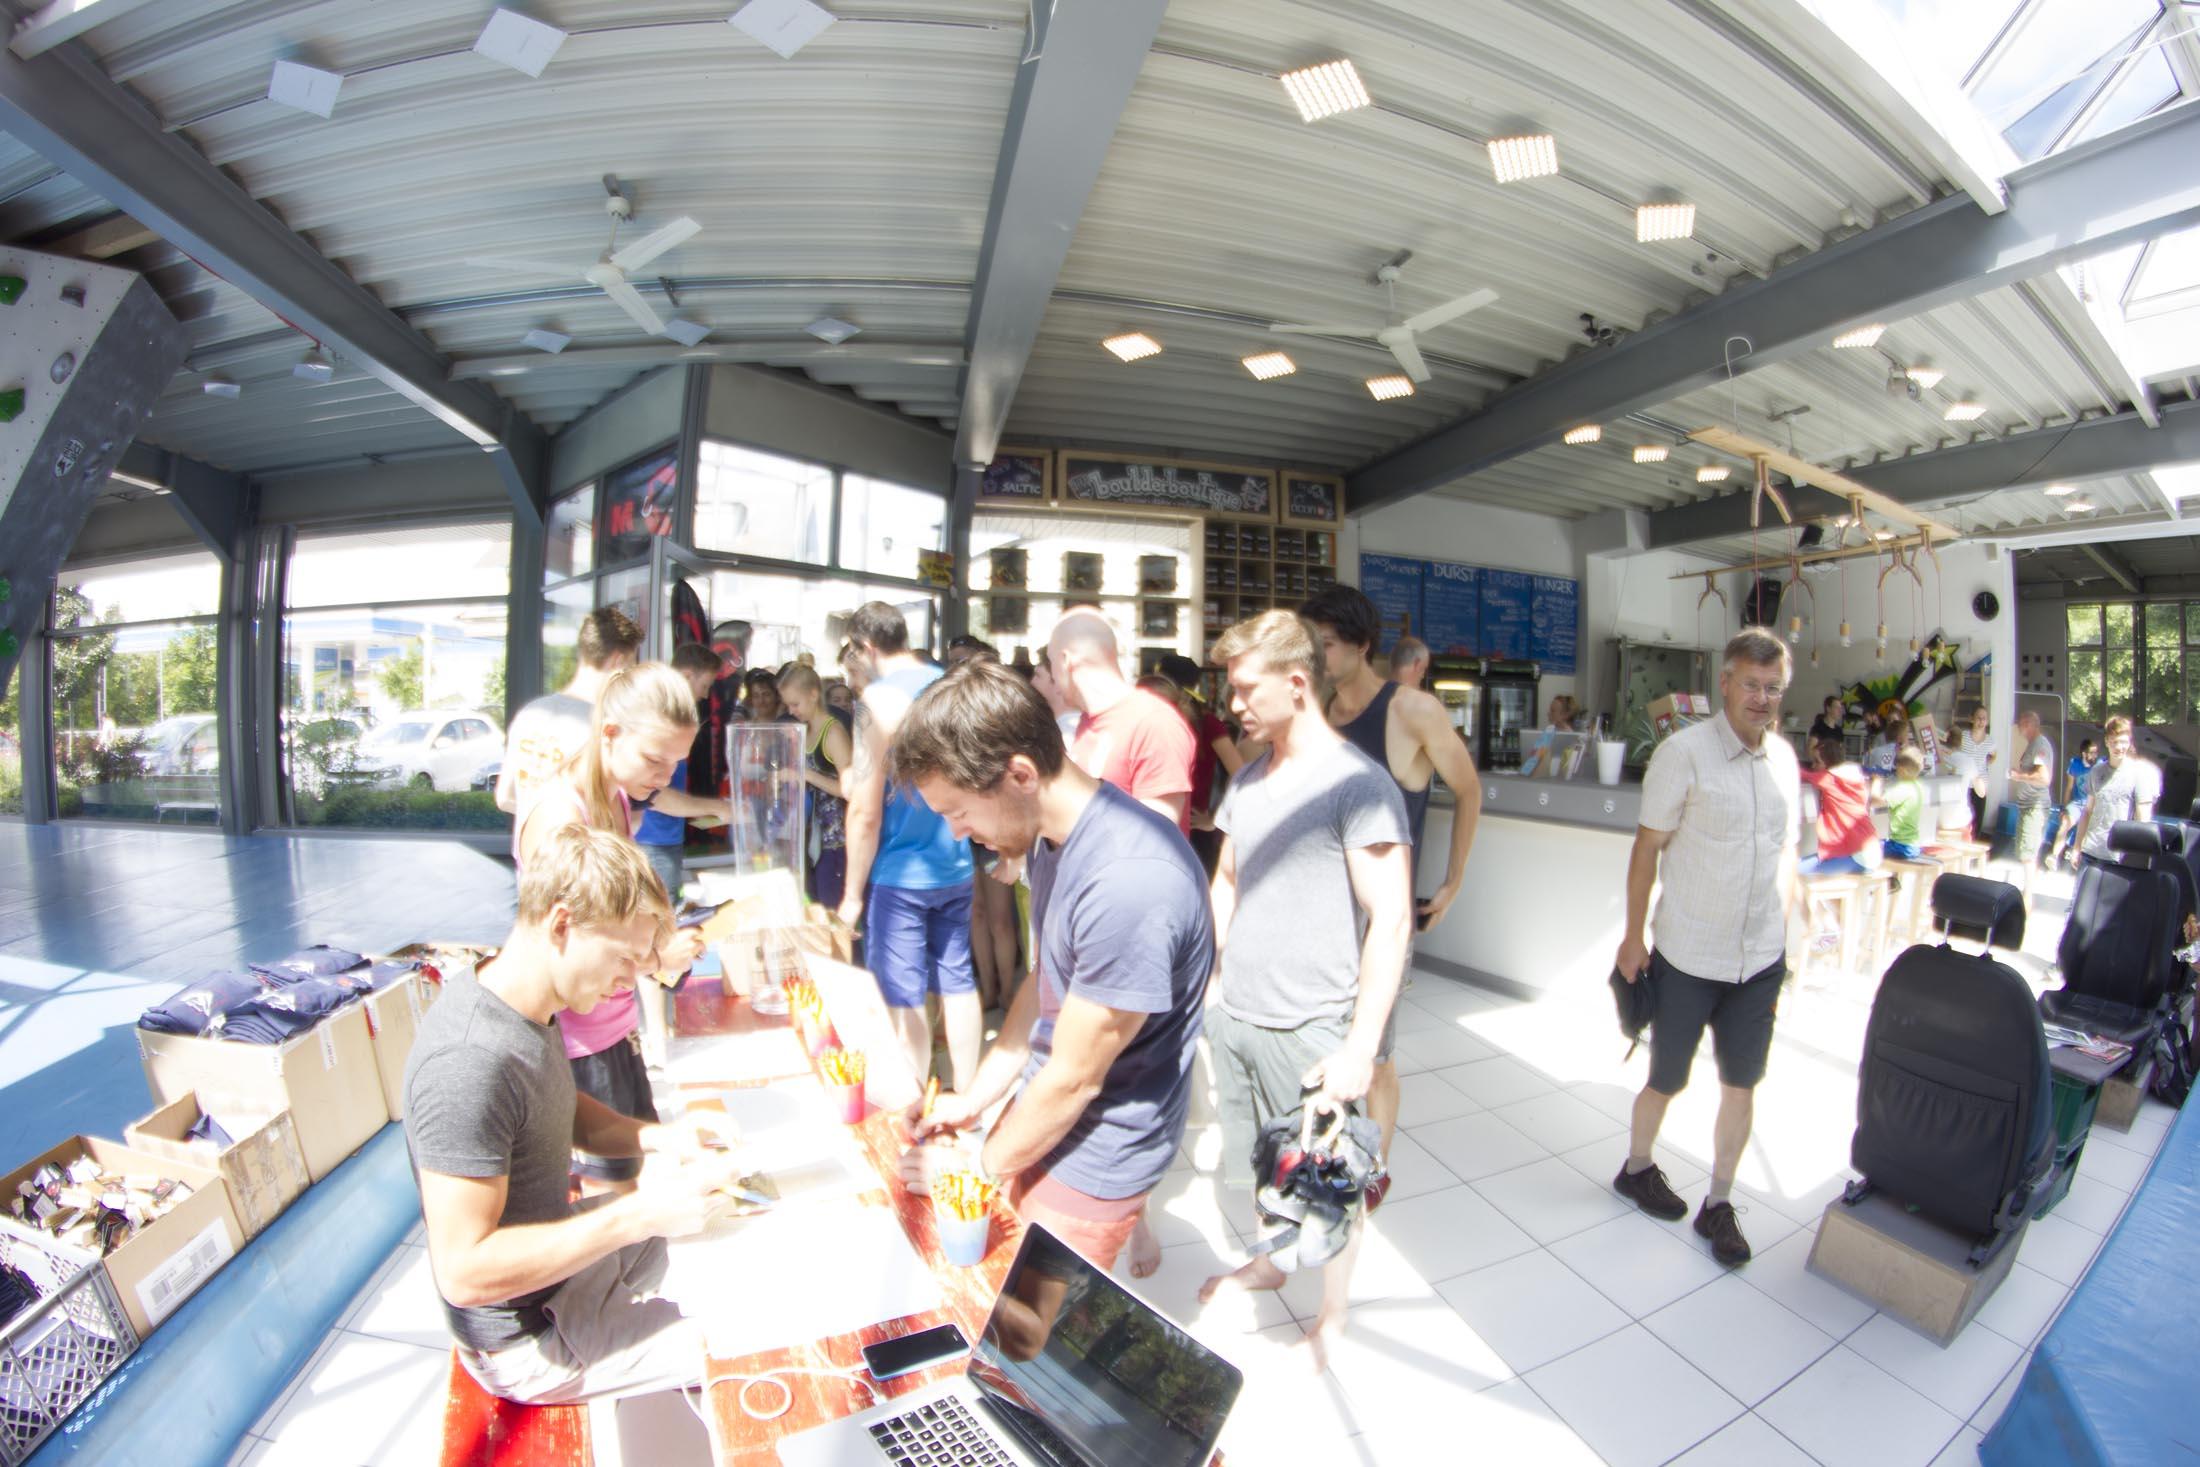 Registration internationaler bouldercup Frankenjura 2016, BLOCKHELDEN Erlangen, Mammut, Bergfreunde.de, Boulderwettkampf07092016053